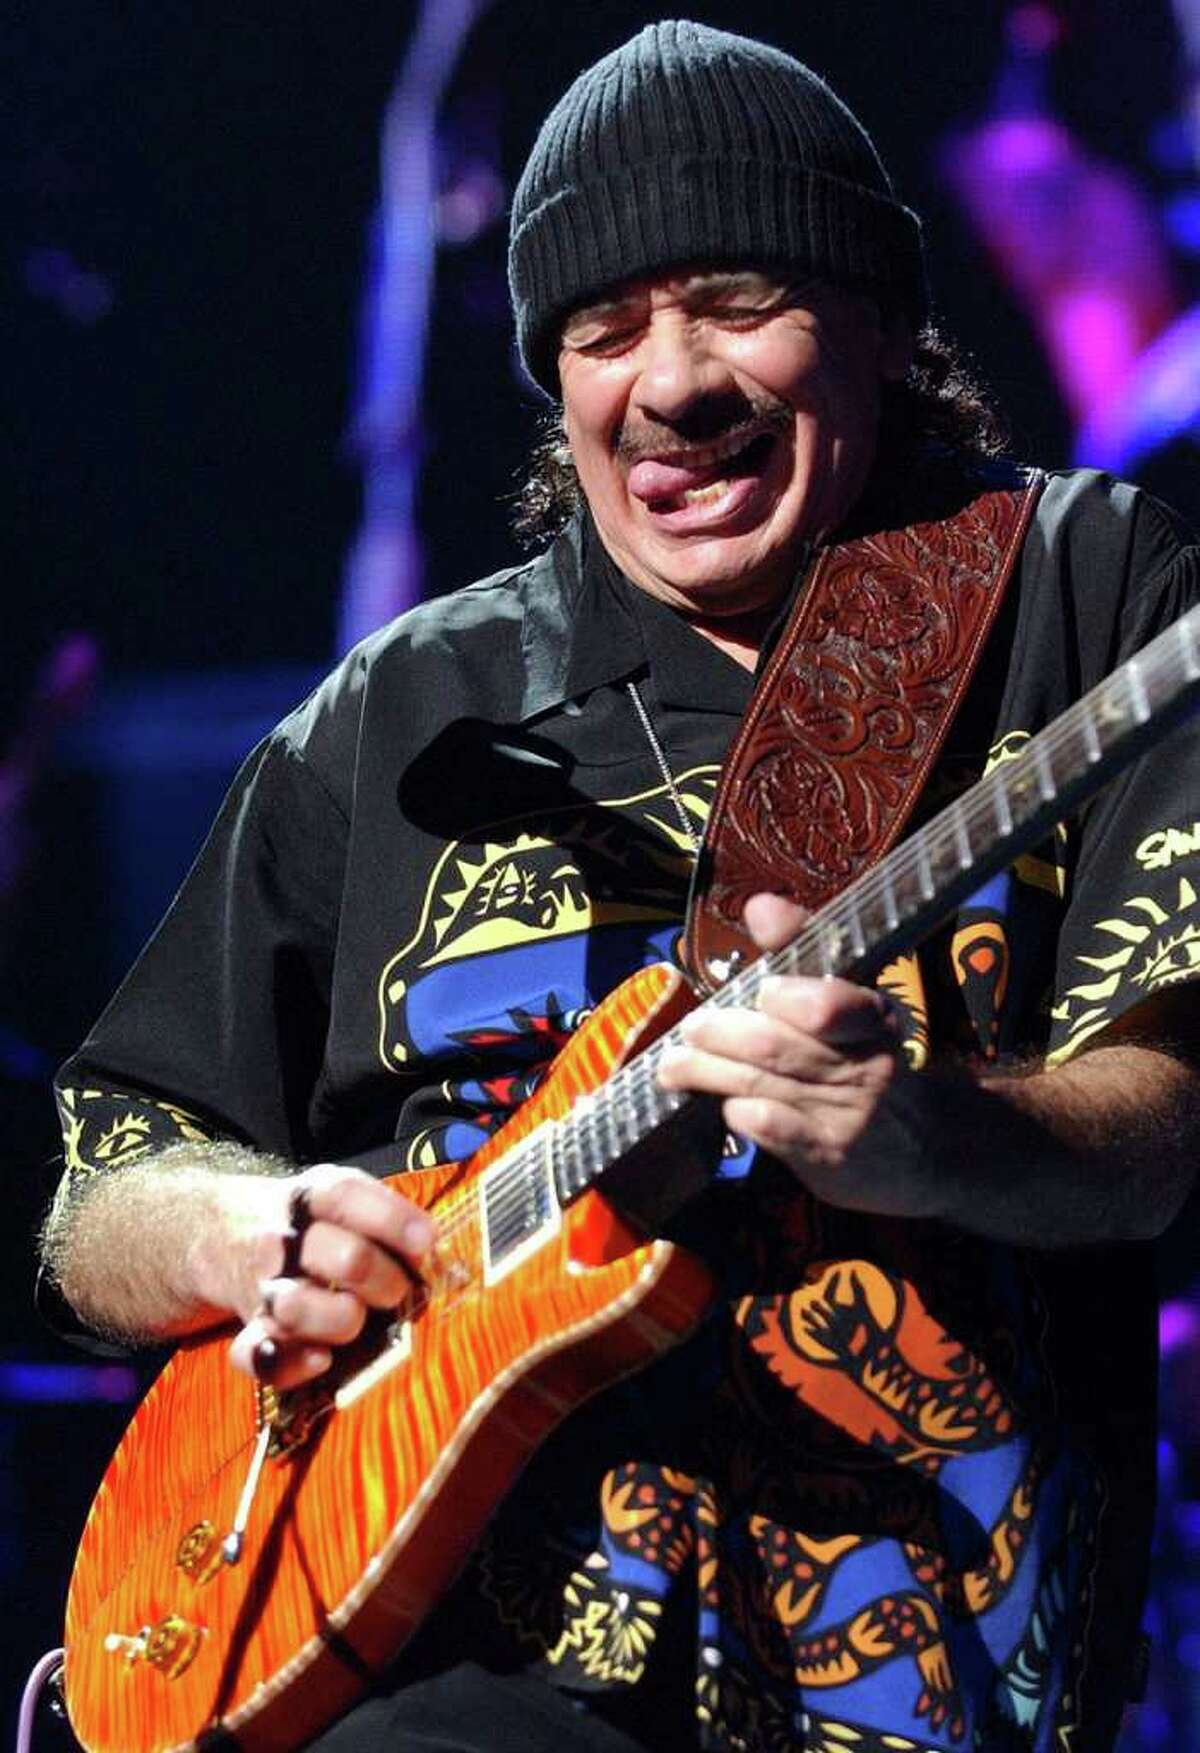 Carlos Santana performs Thursday Oct. 6, 2005 at the SBC Center. PHOTO BY EDWARD A. ORNELAS/STAFF